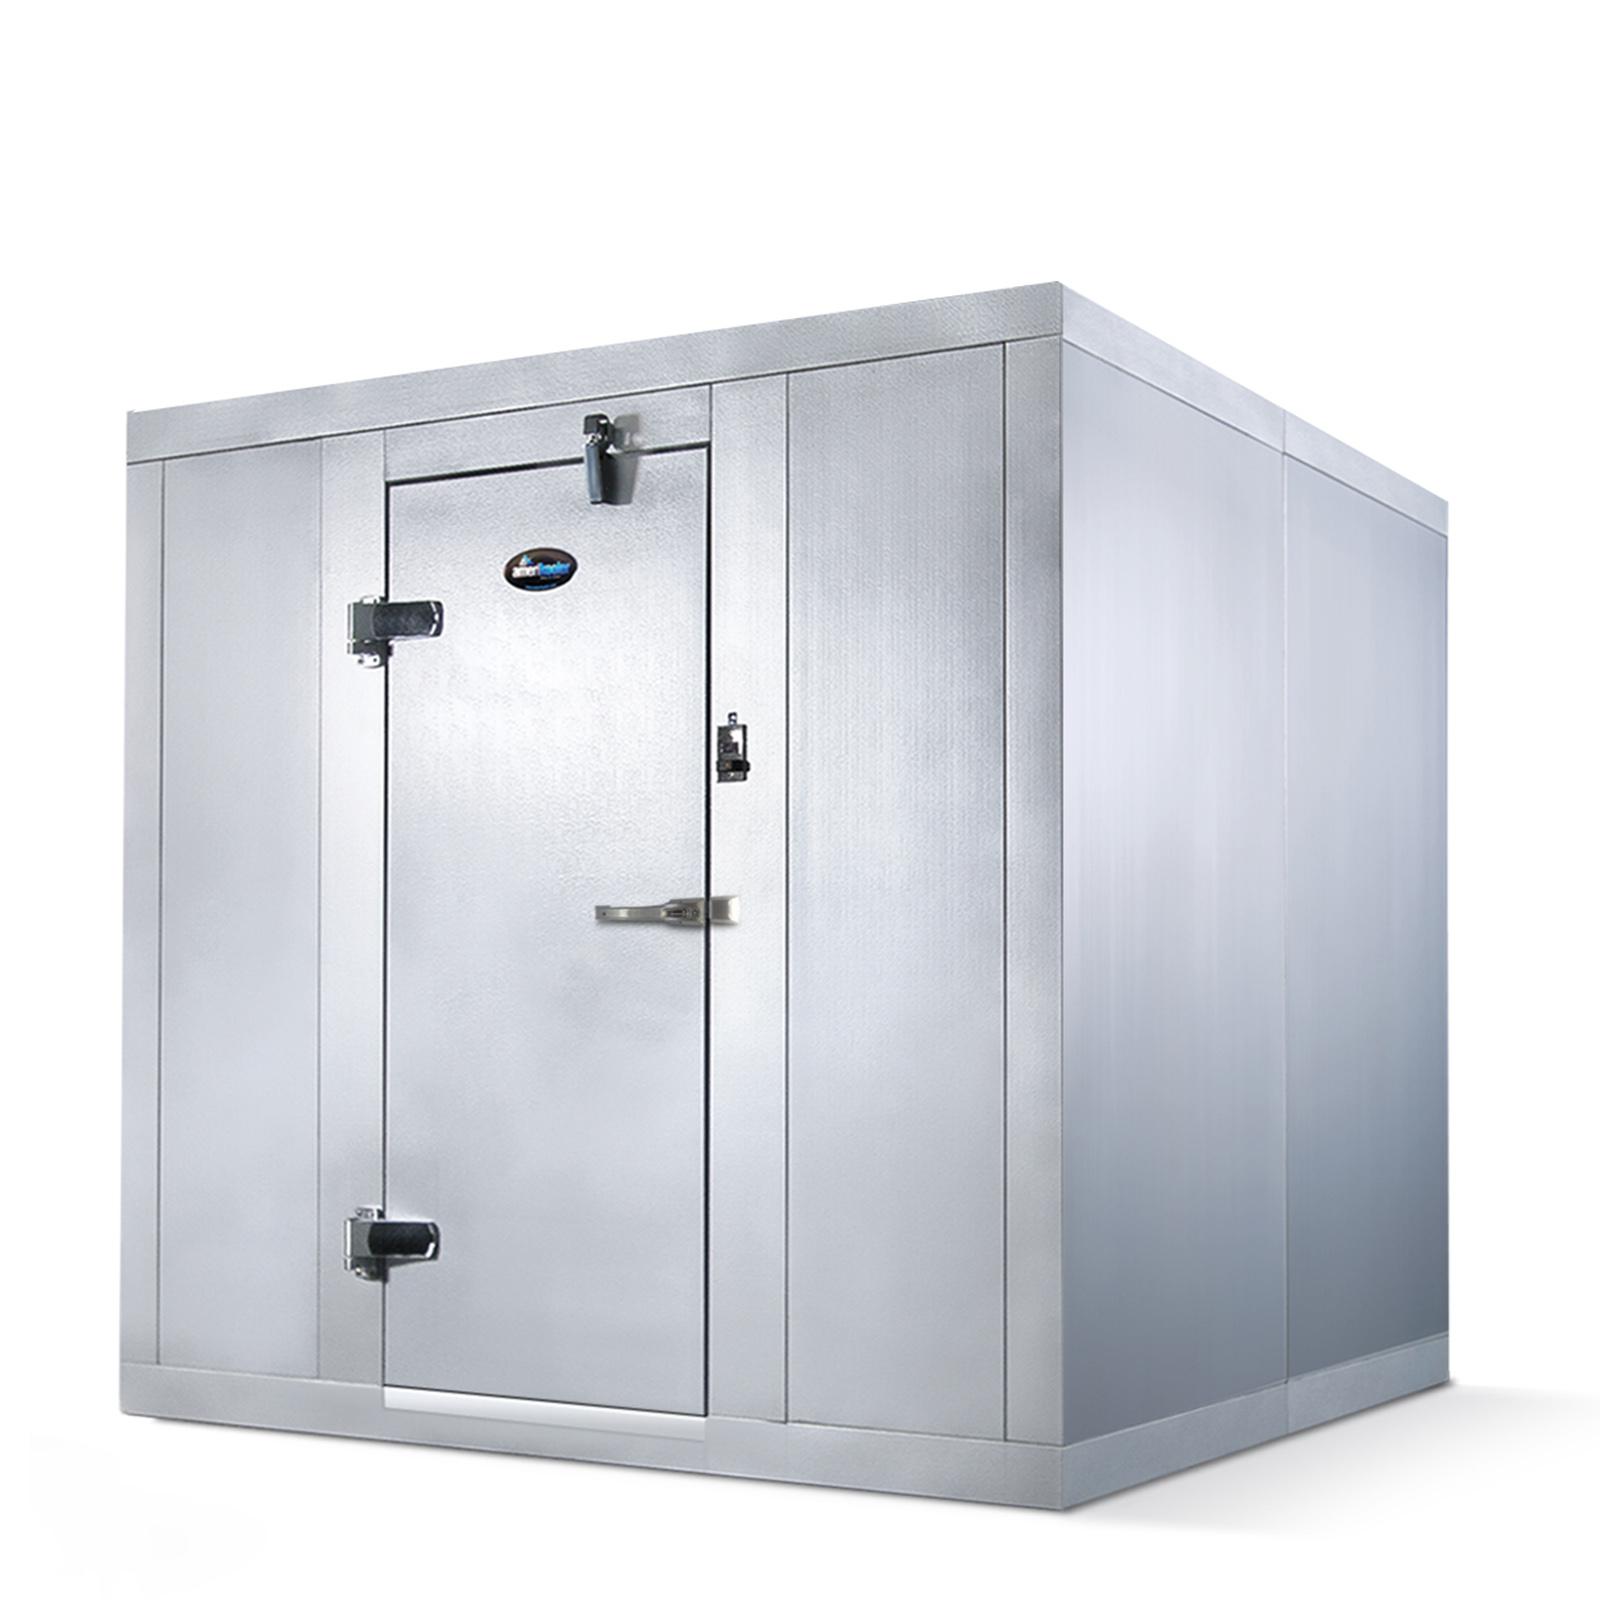 AmeriKooler QF081077**FBRF-O walk in freezer, modular, remote